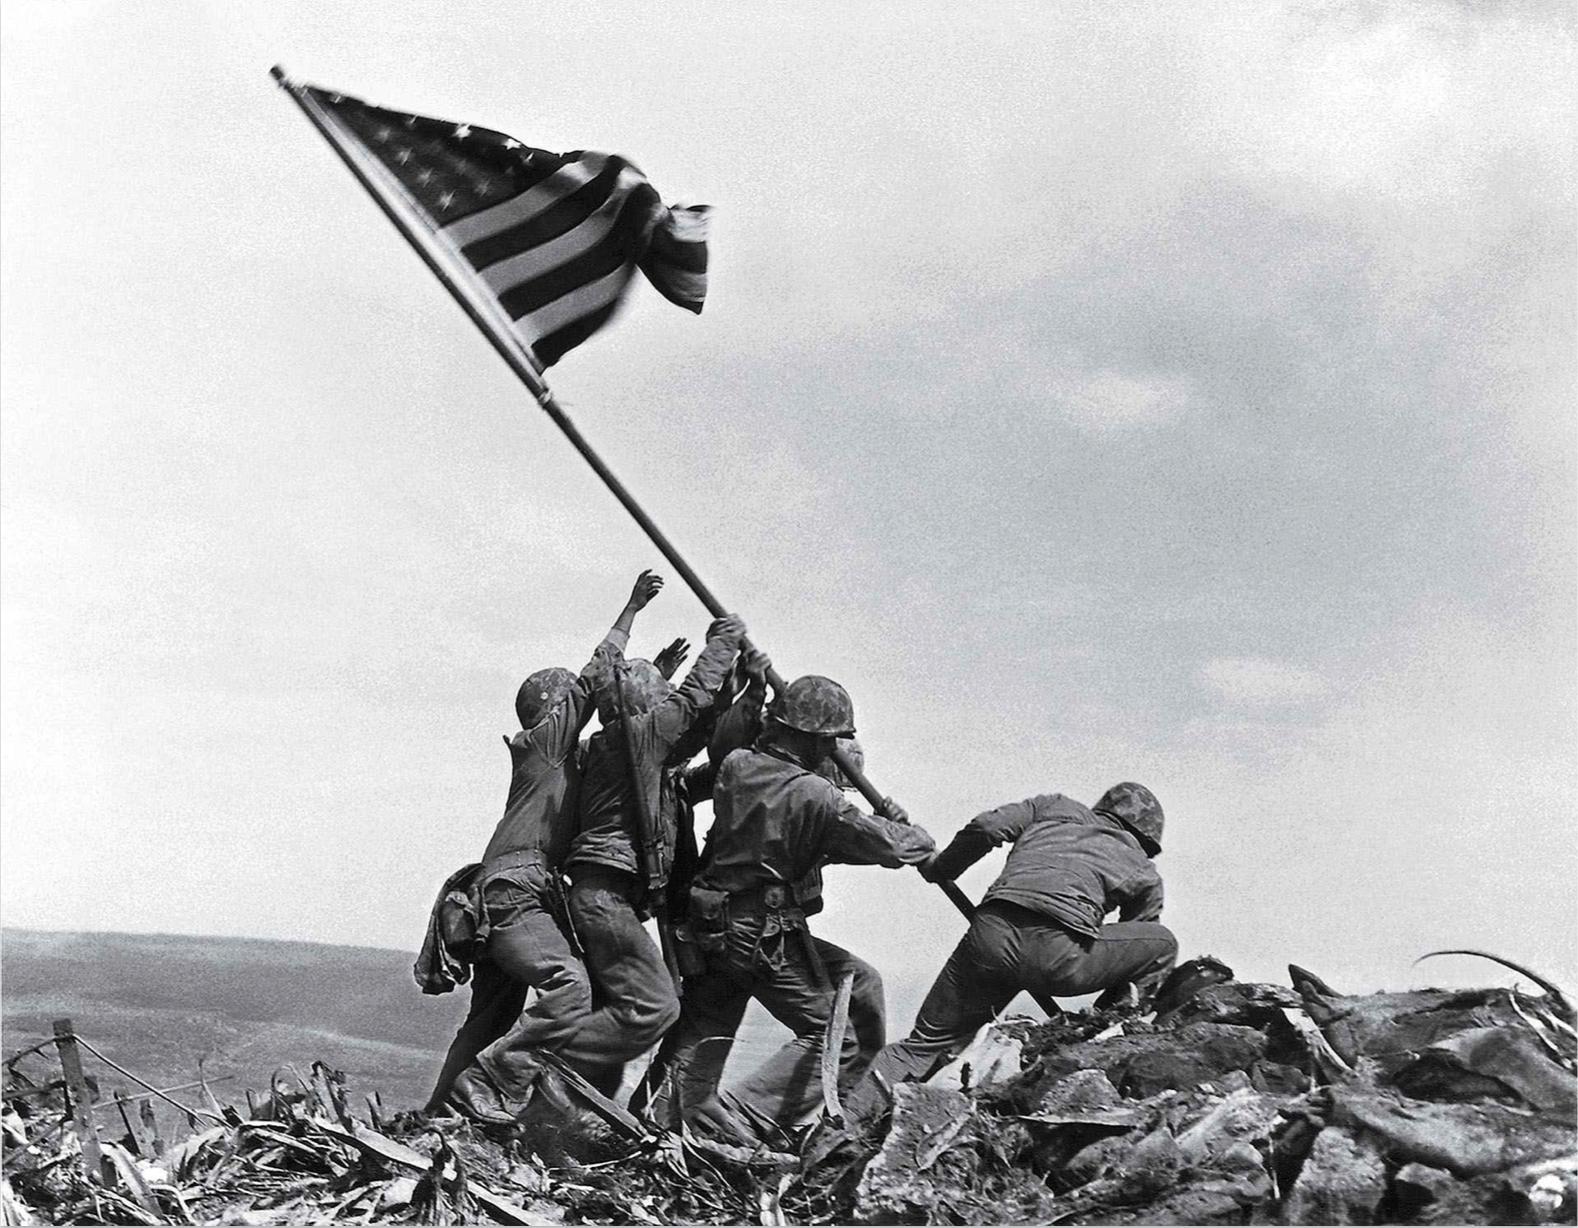 Flag Raising on Iwo Jima by Joe Rosenthal (1945)